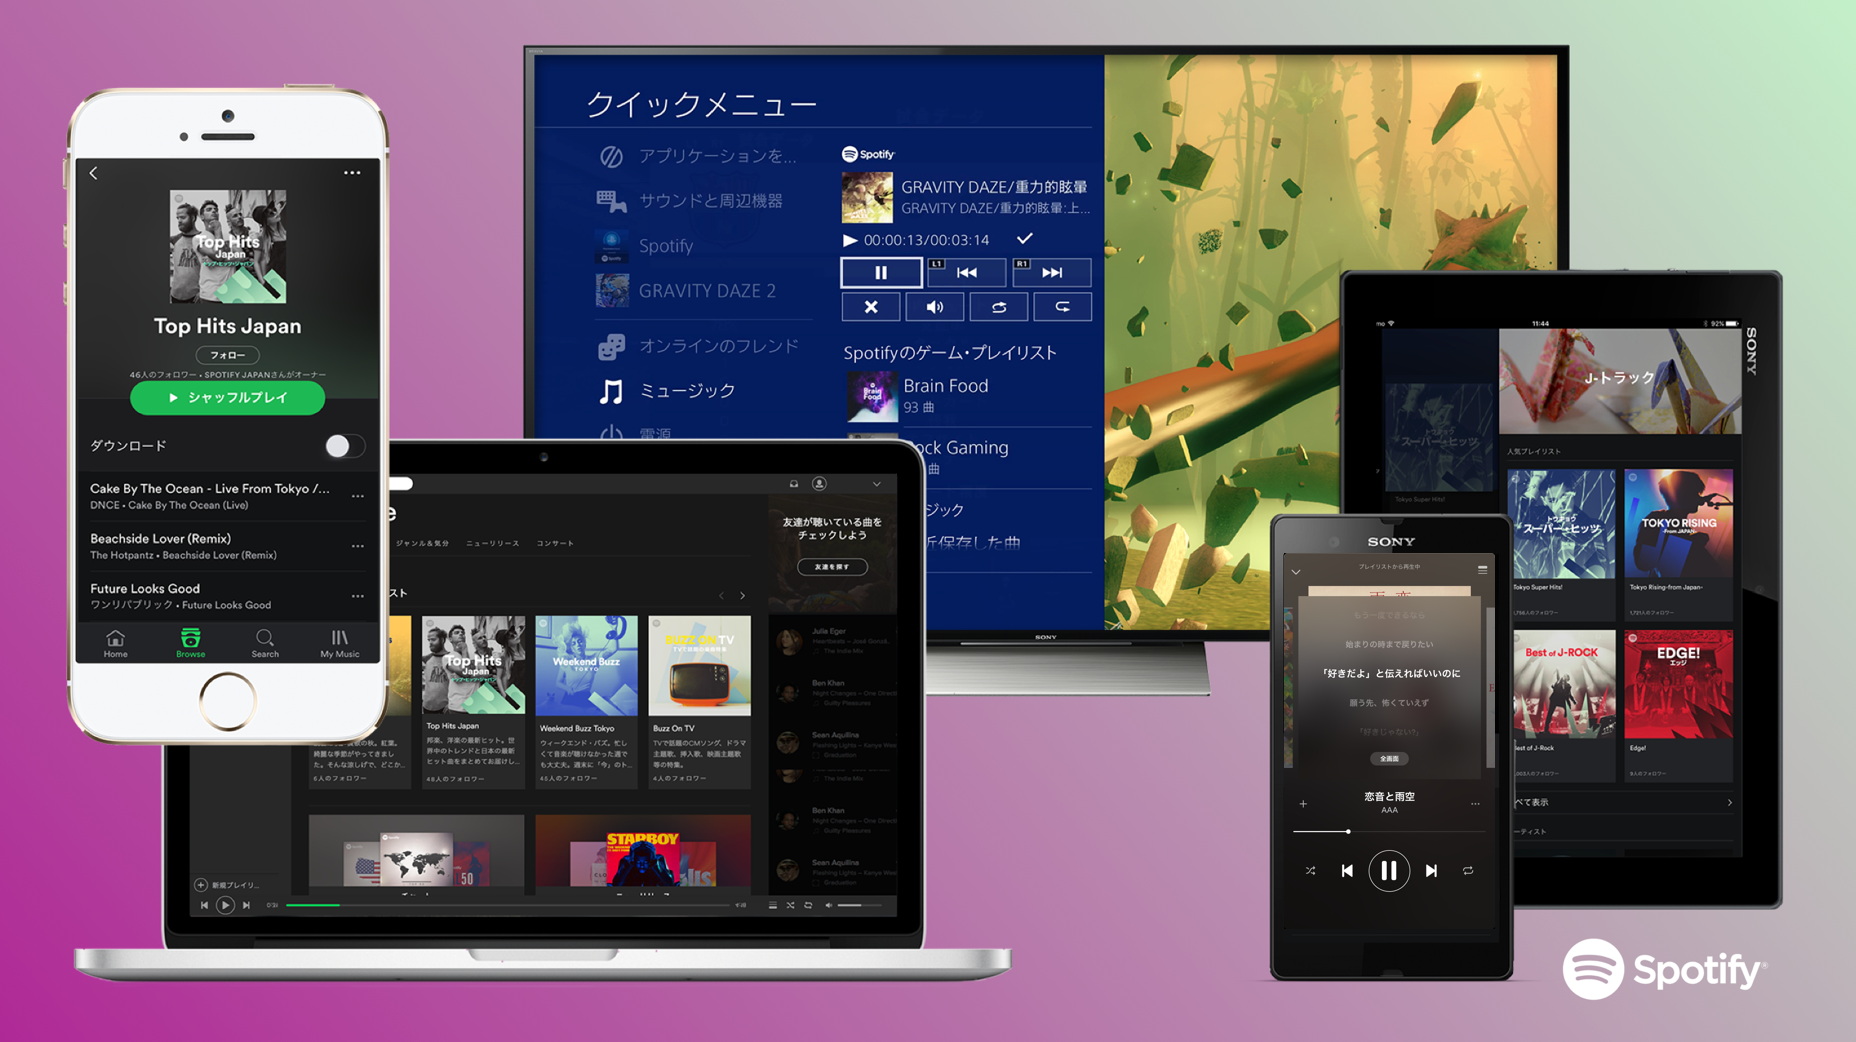 spotify, japan, cd, daniel ek, compact disc, streaming music